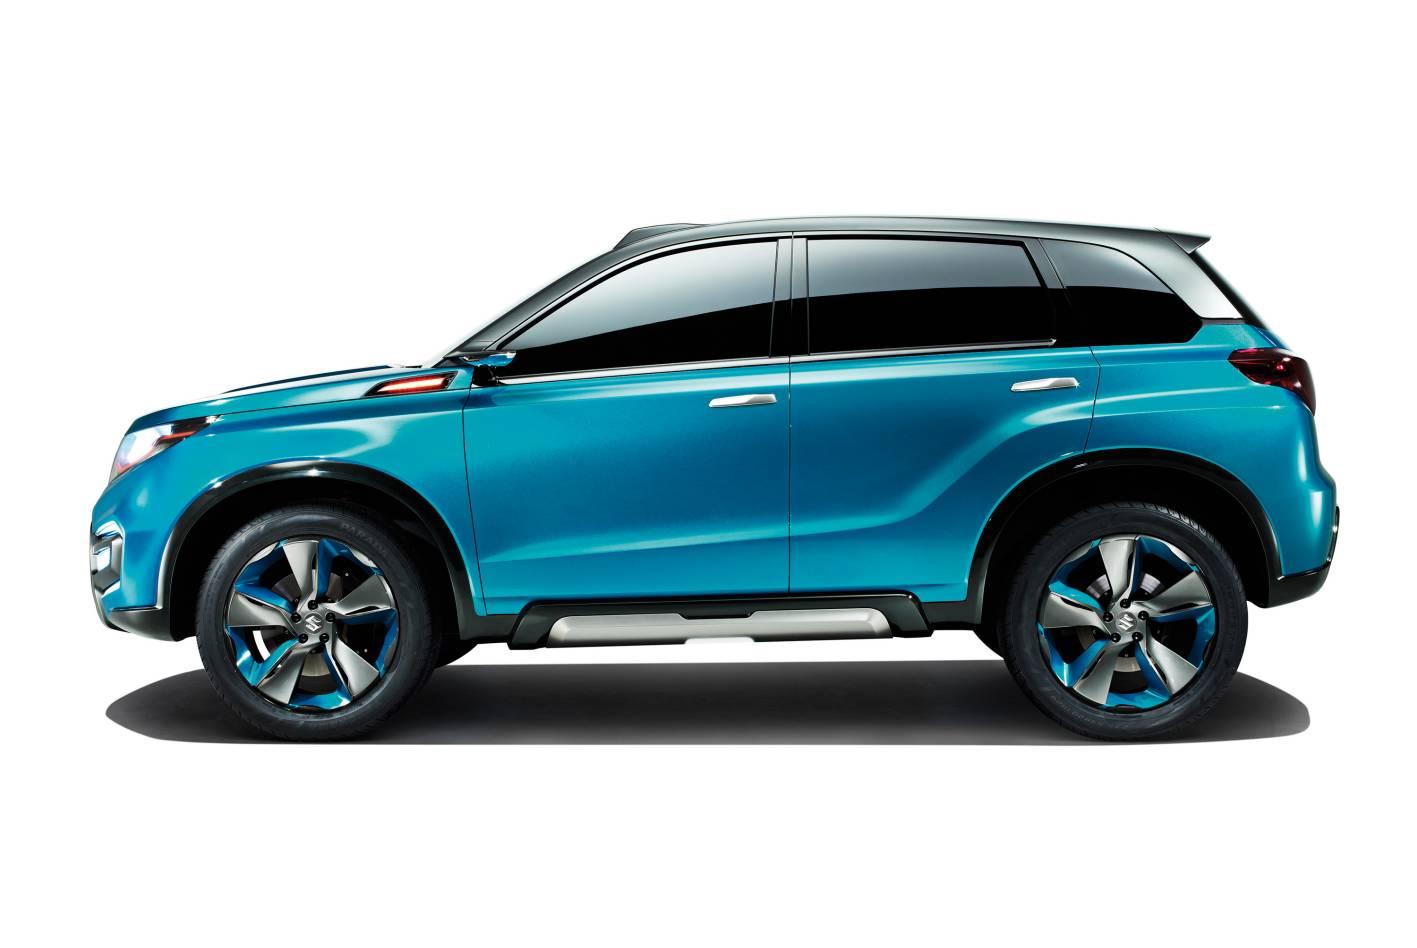 Suzuki Cars - News: iV-4 compact SUV hints at new Vitara